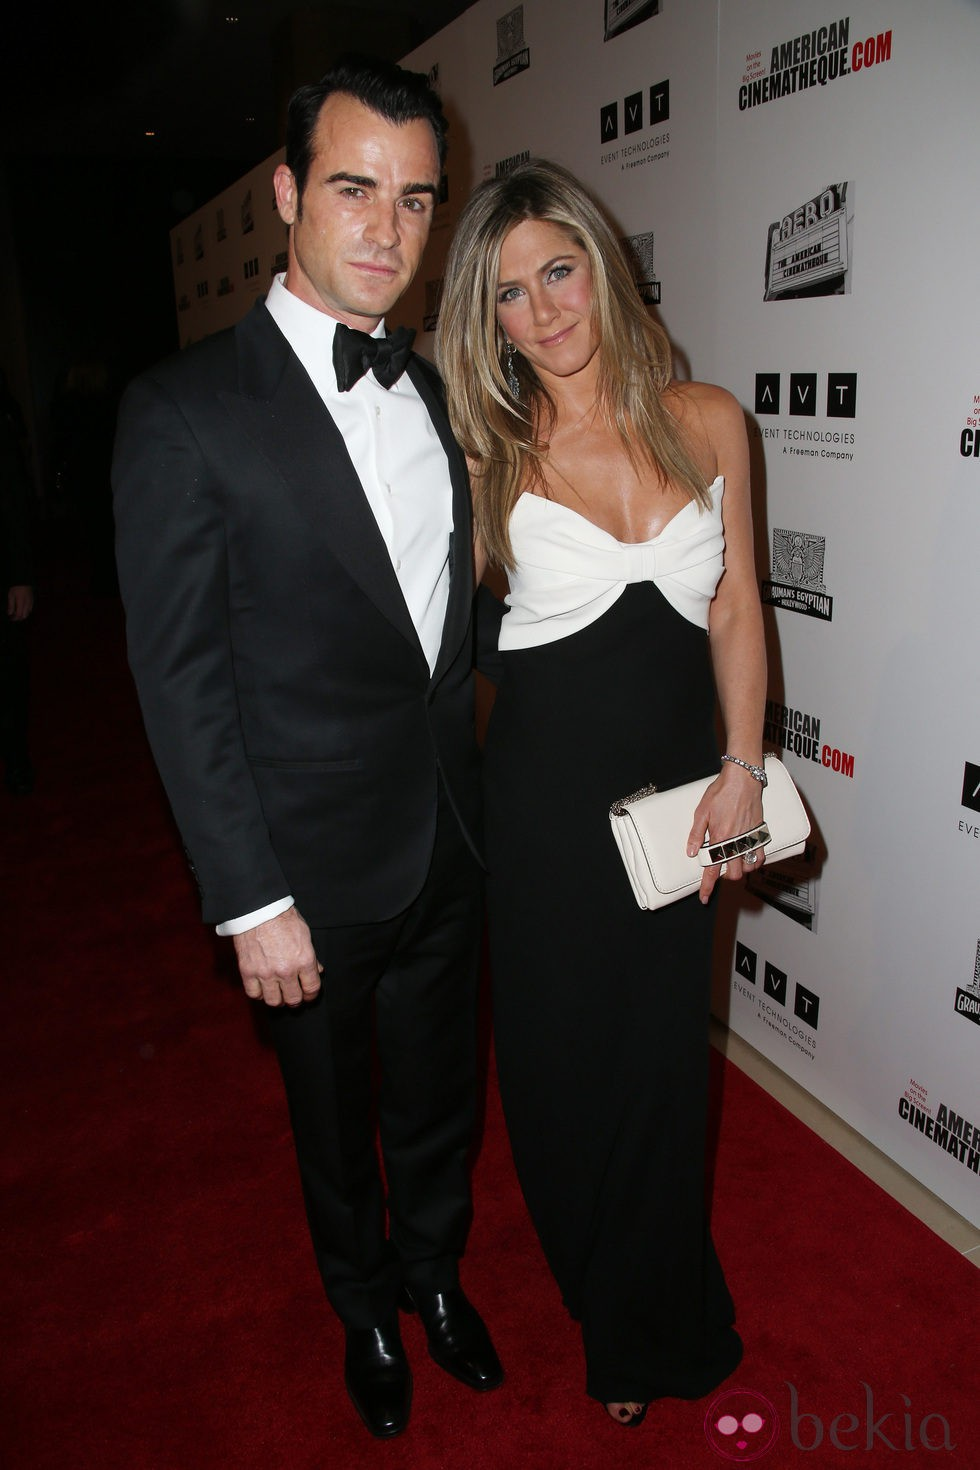 Jennifer Aniston y Justin Theroux en un homenaje a Ben Stiller